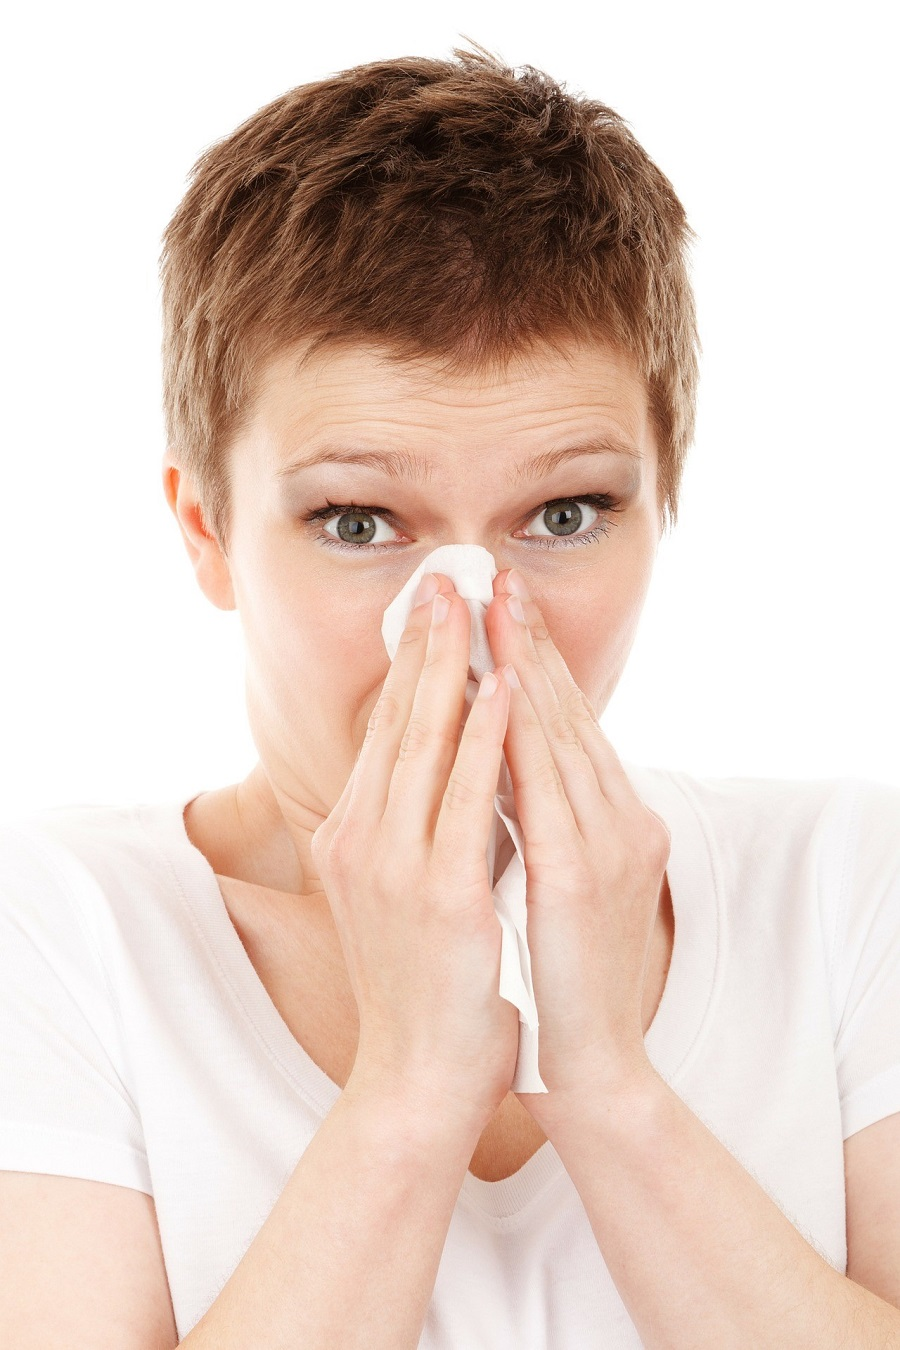 Facial viral infections